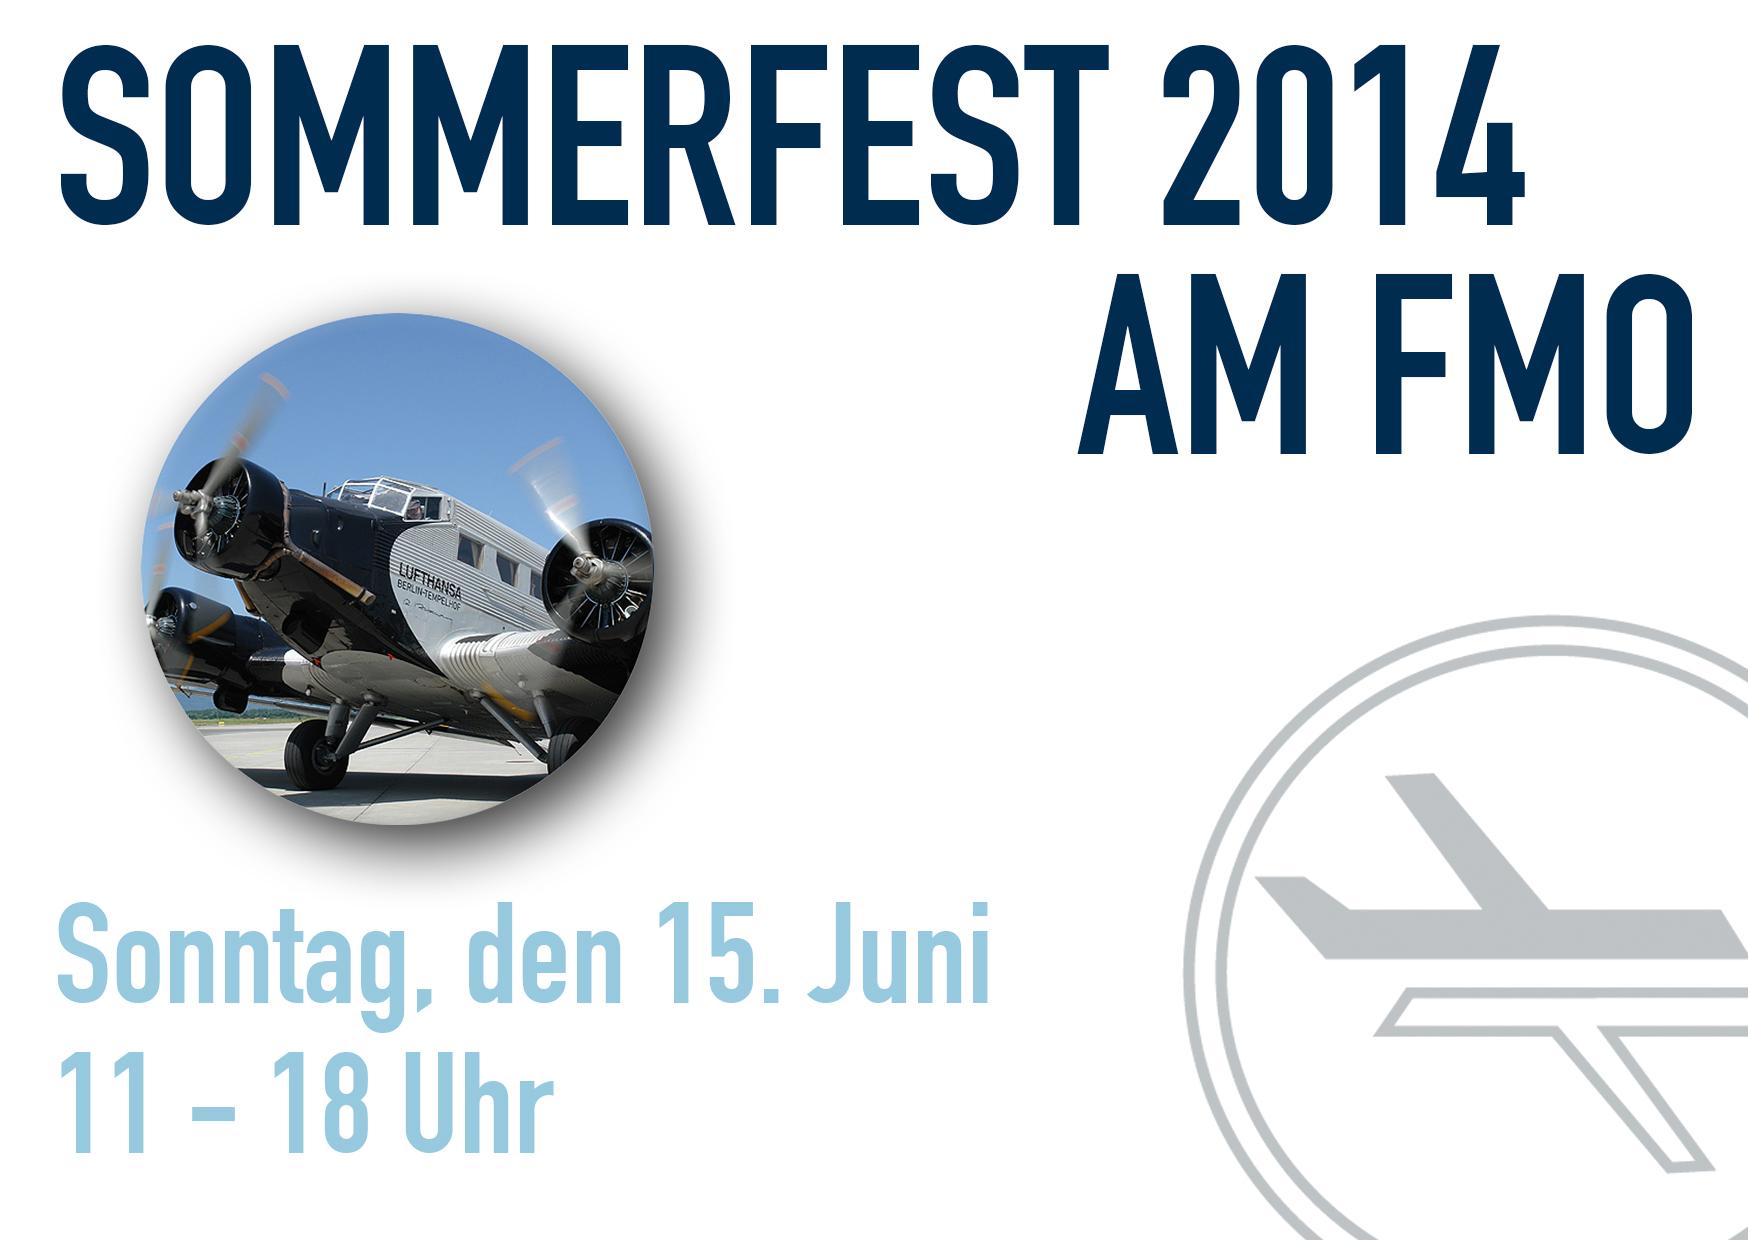 Sommerfest am 15. Juni am Flughafen Münster/Osnabrück